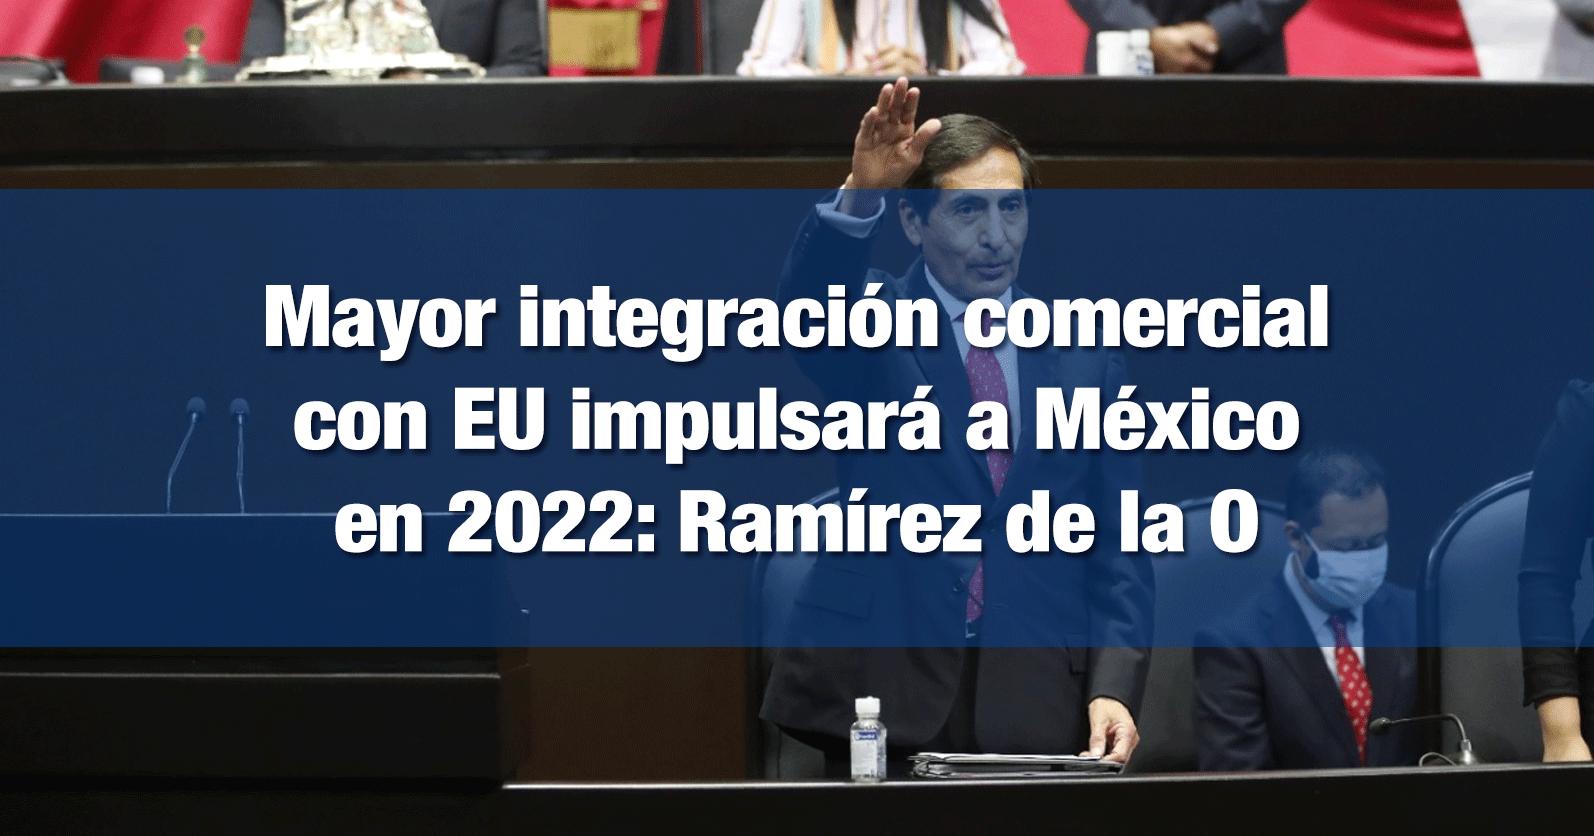 Mayor integración comercial con EU impulsará a México en 2022: Ramírez de la O